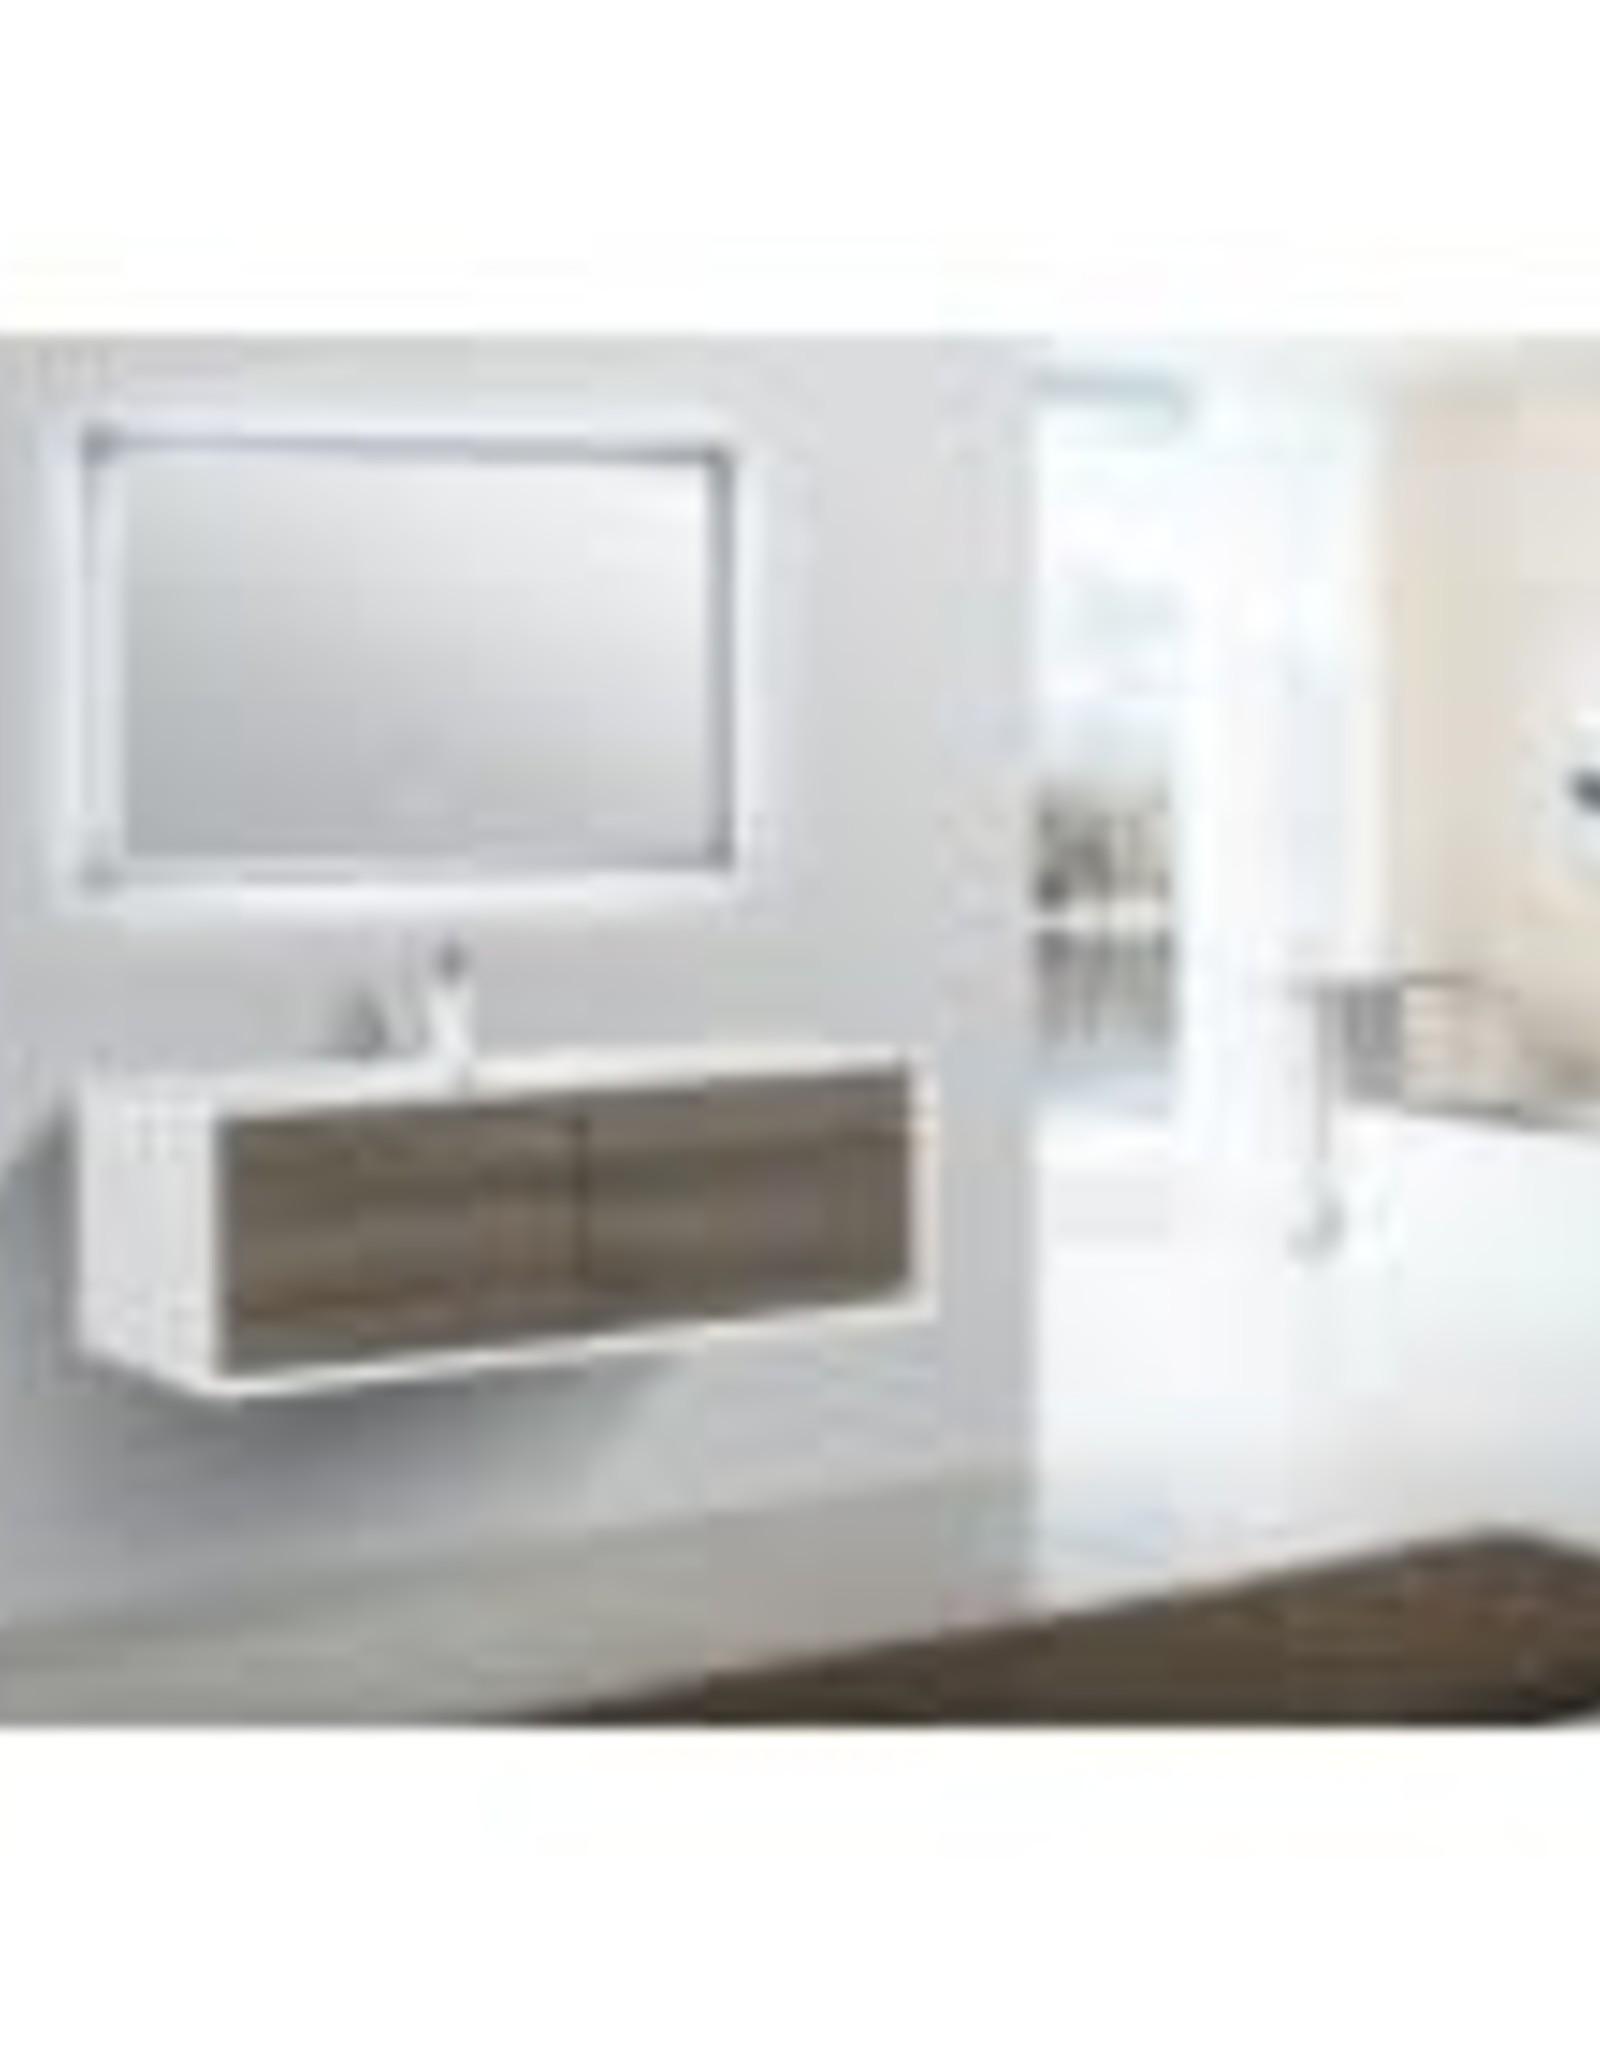 "Classic Brand Cabinetry Skandia 48"" Wallmount Vanity w Top Undermount Sink Grey Face"